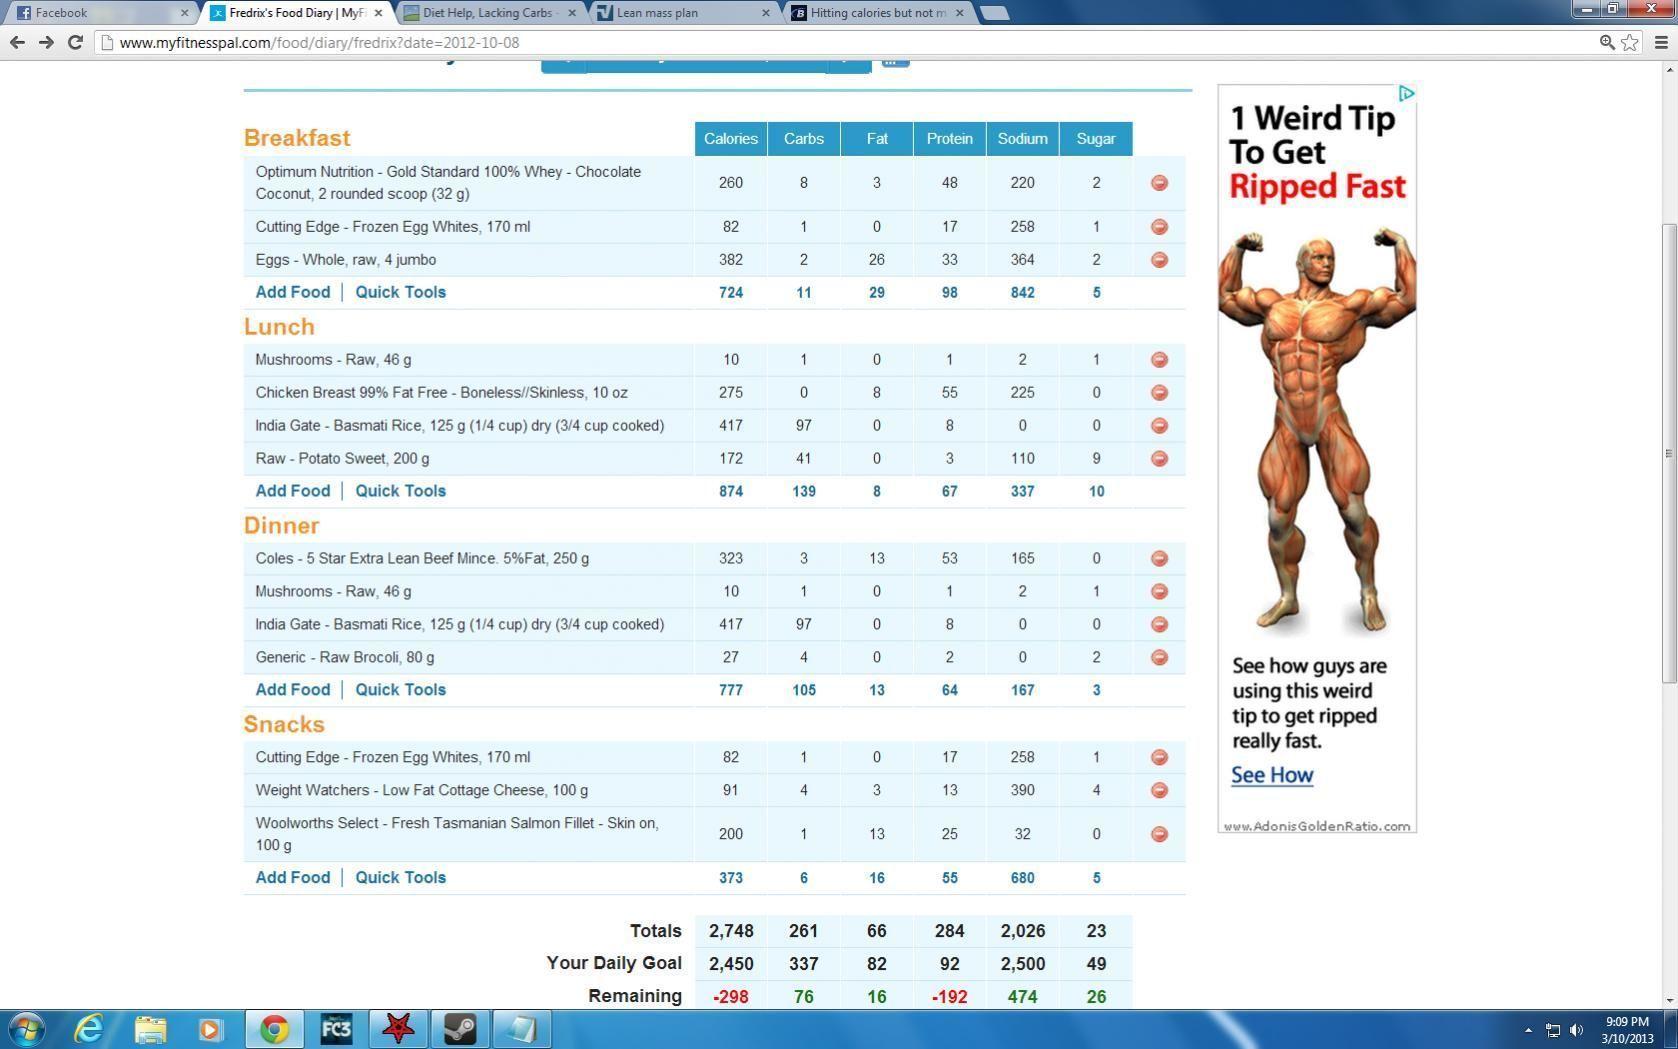 Build Diet Lean Mass Muscle Plan Protein Shake To Gain Muscle How To Make Proteinshake Build Diet Lean Mass M Proteinshake Muskeln Sixpack Workout